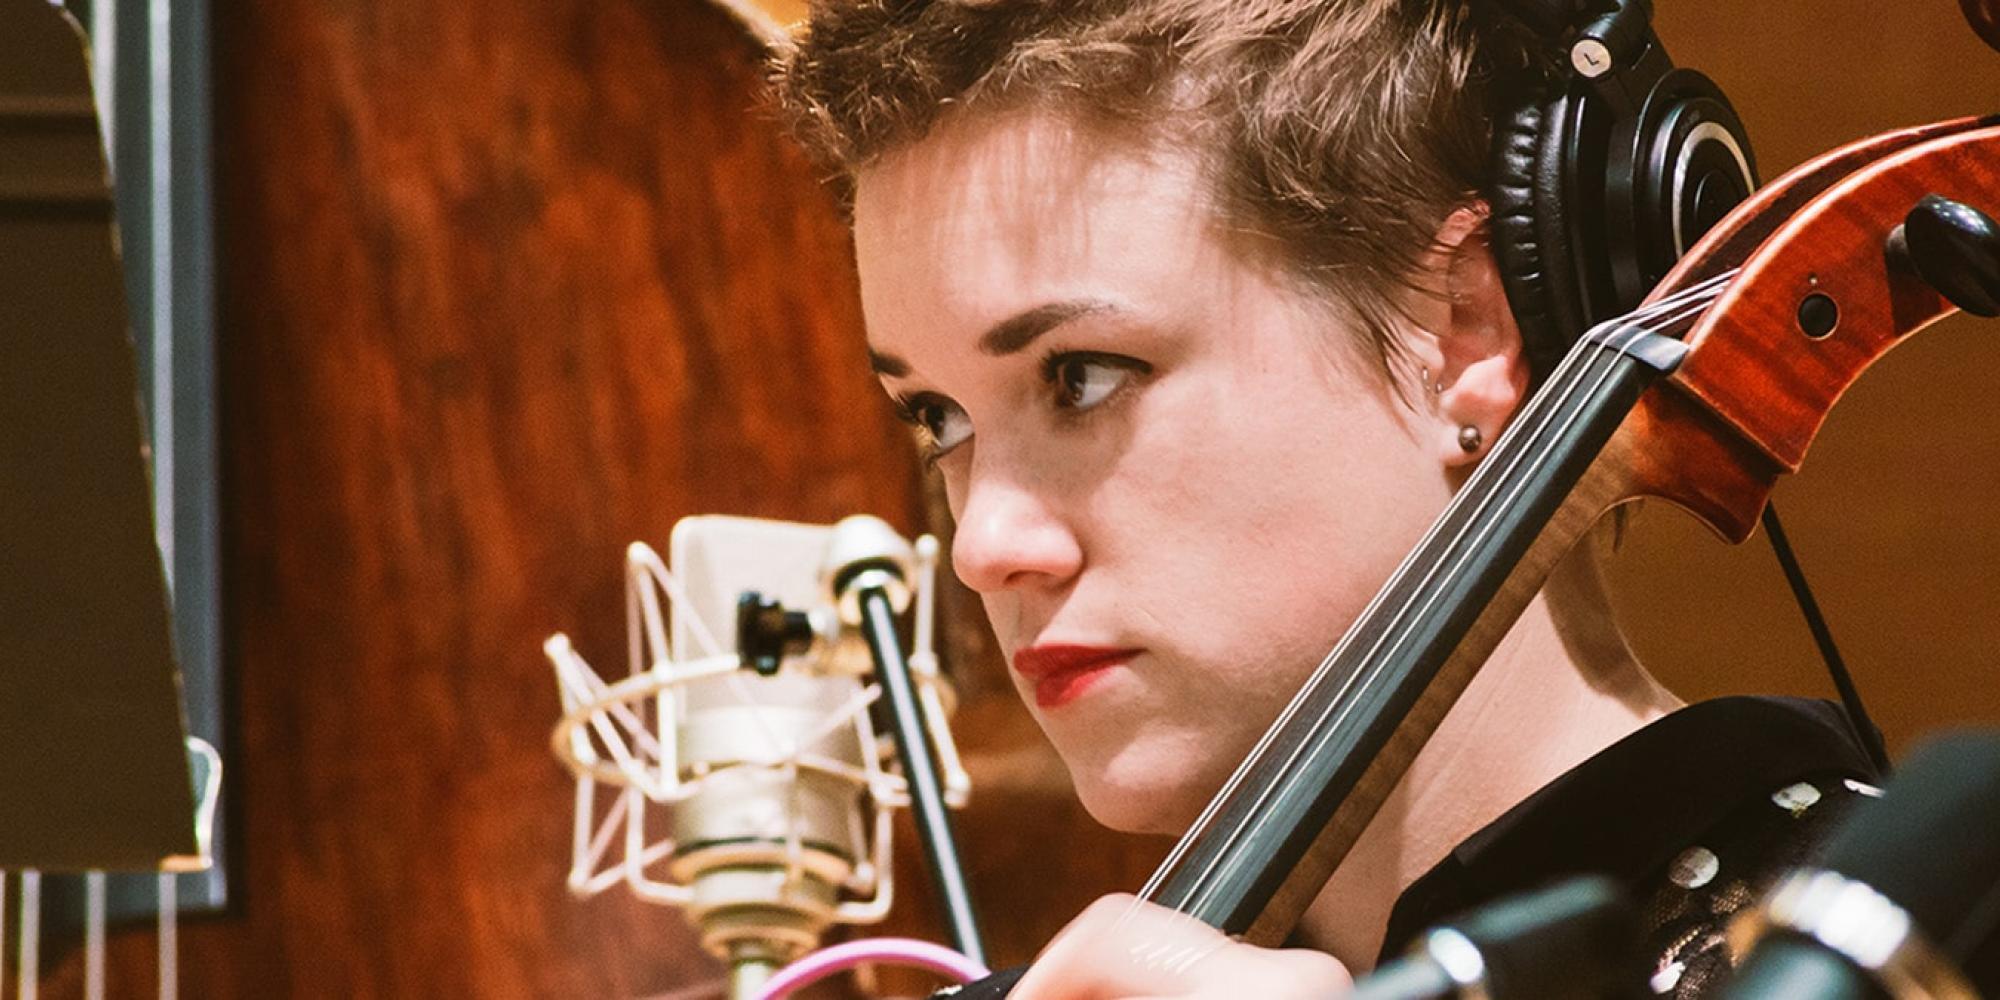 generic cello performance photo microphone vocalist